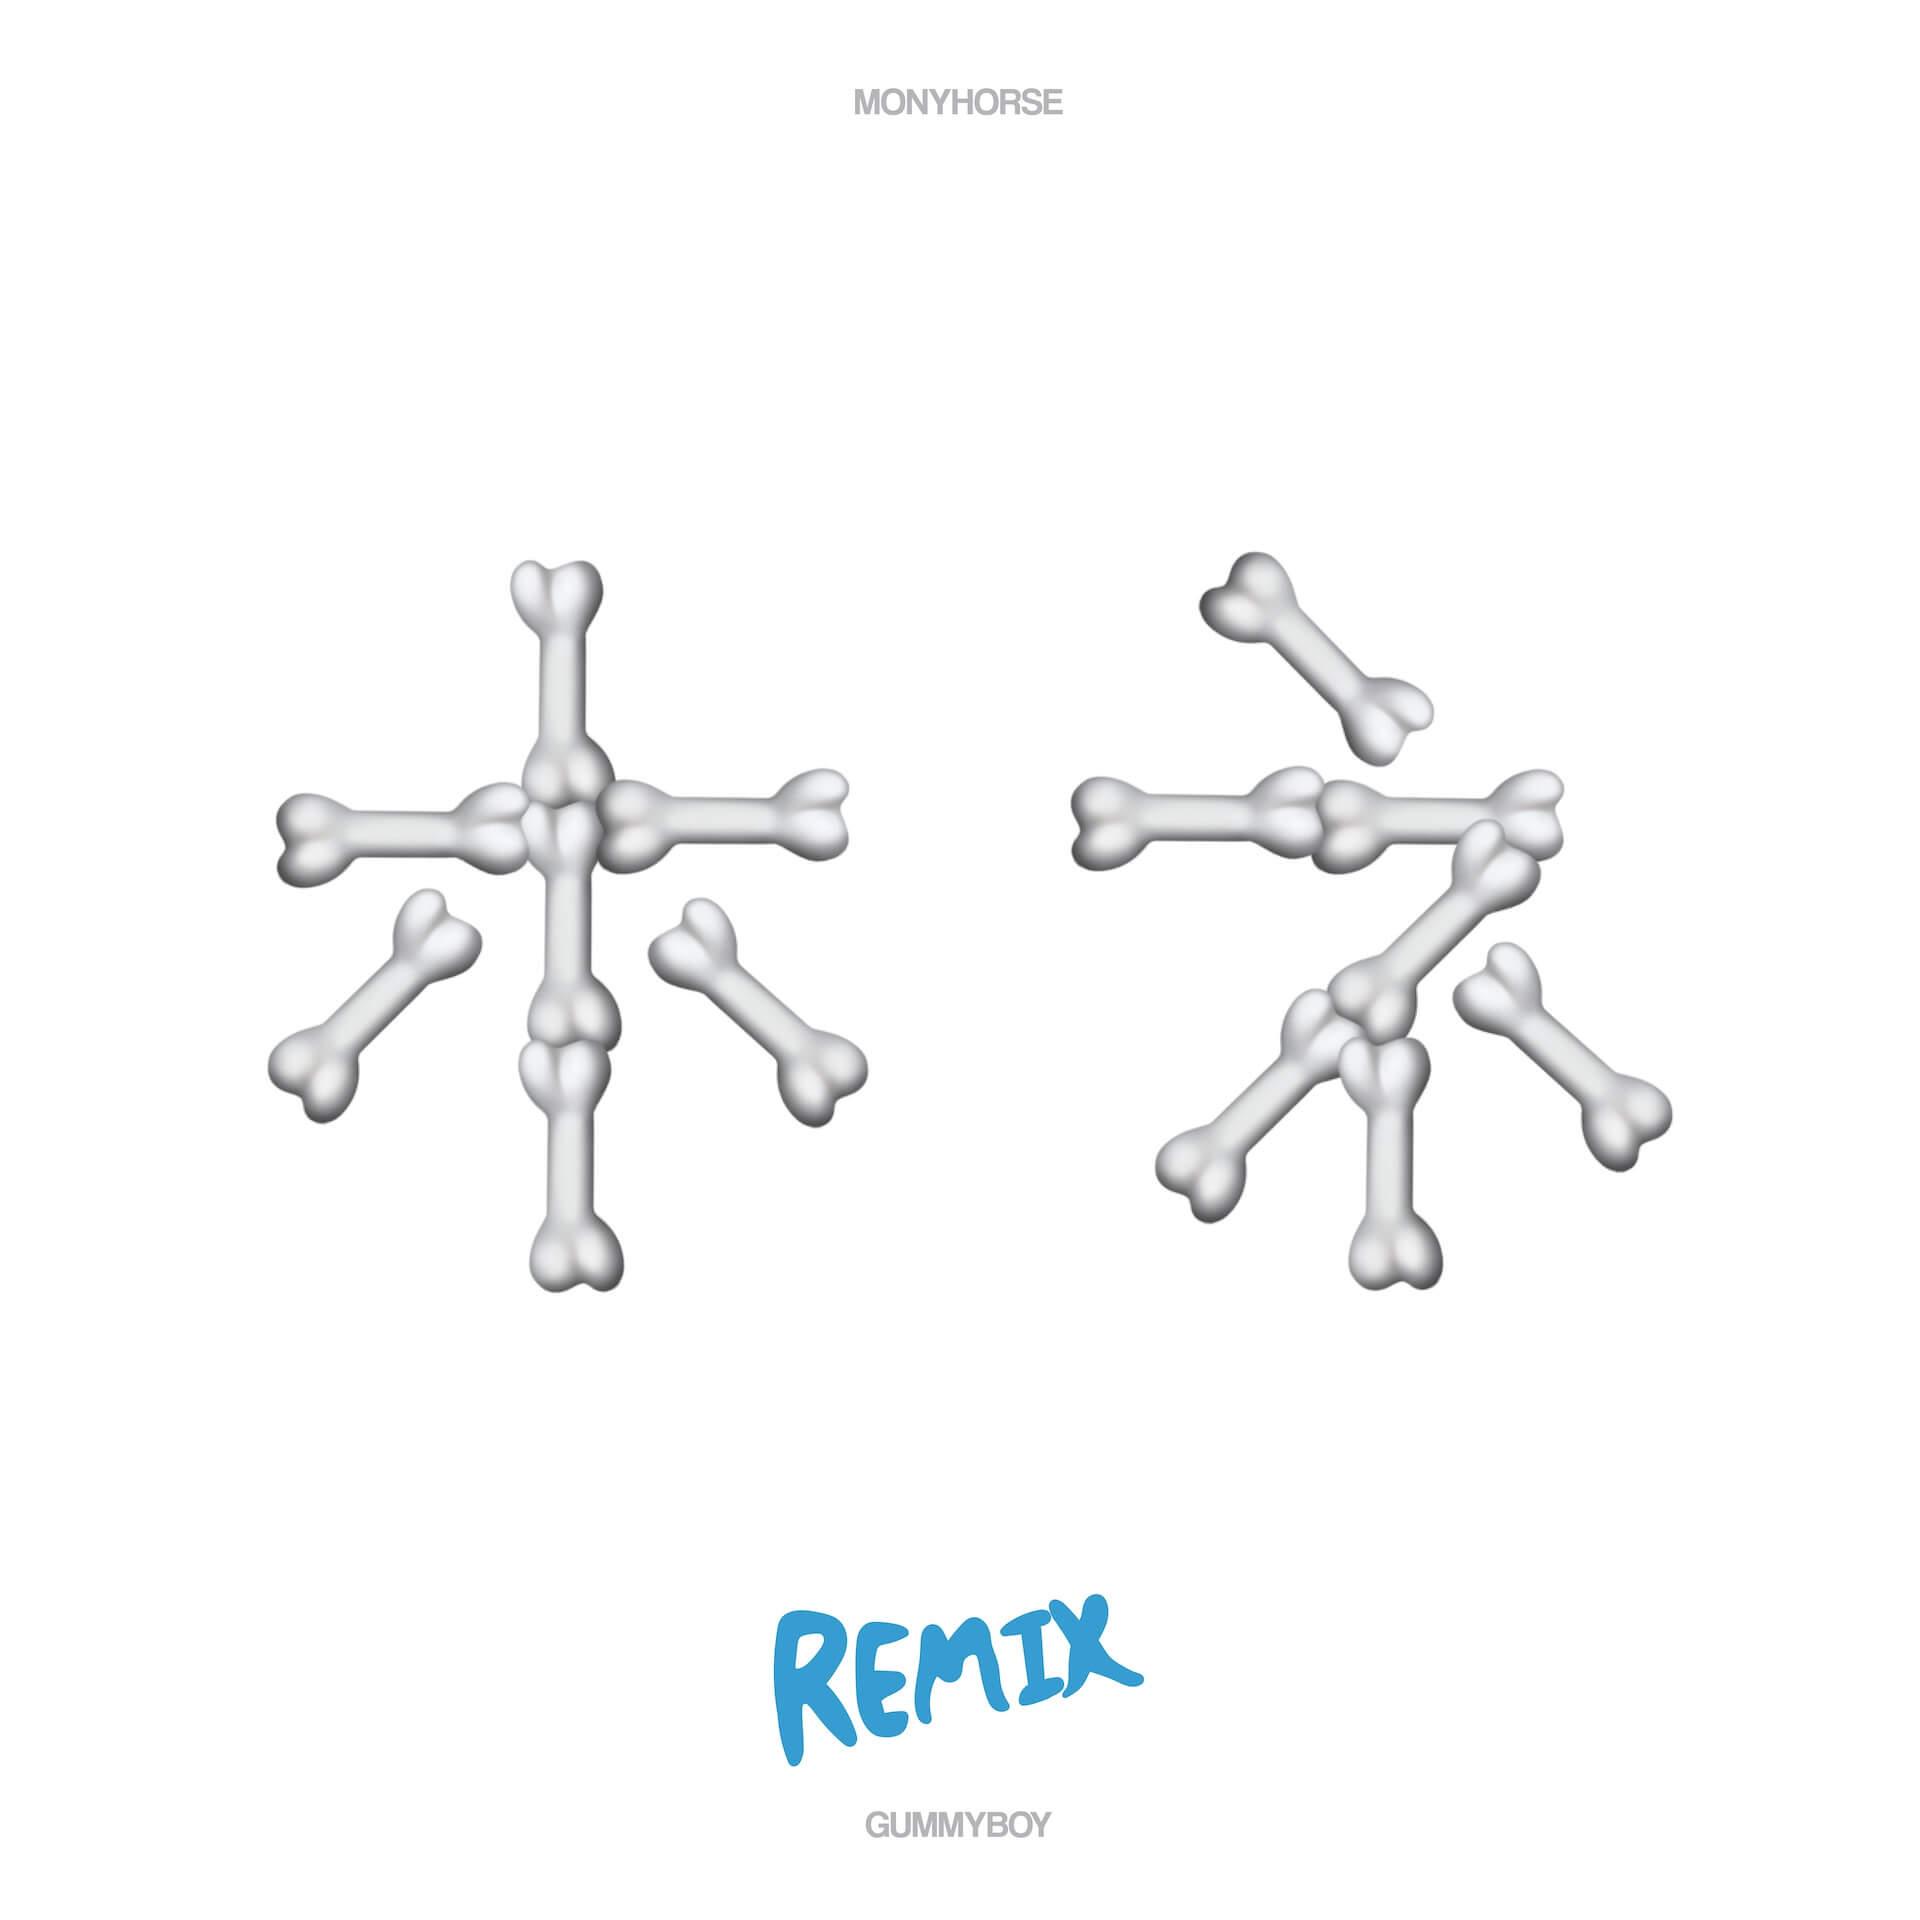 "gummyboyがミックステープの1曲目""hone(remix)""をサプライズリリース!YENTOWNのMonyHorseが客演 music200318_hone_03"